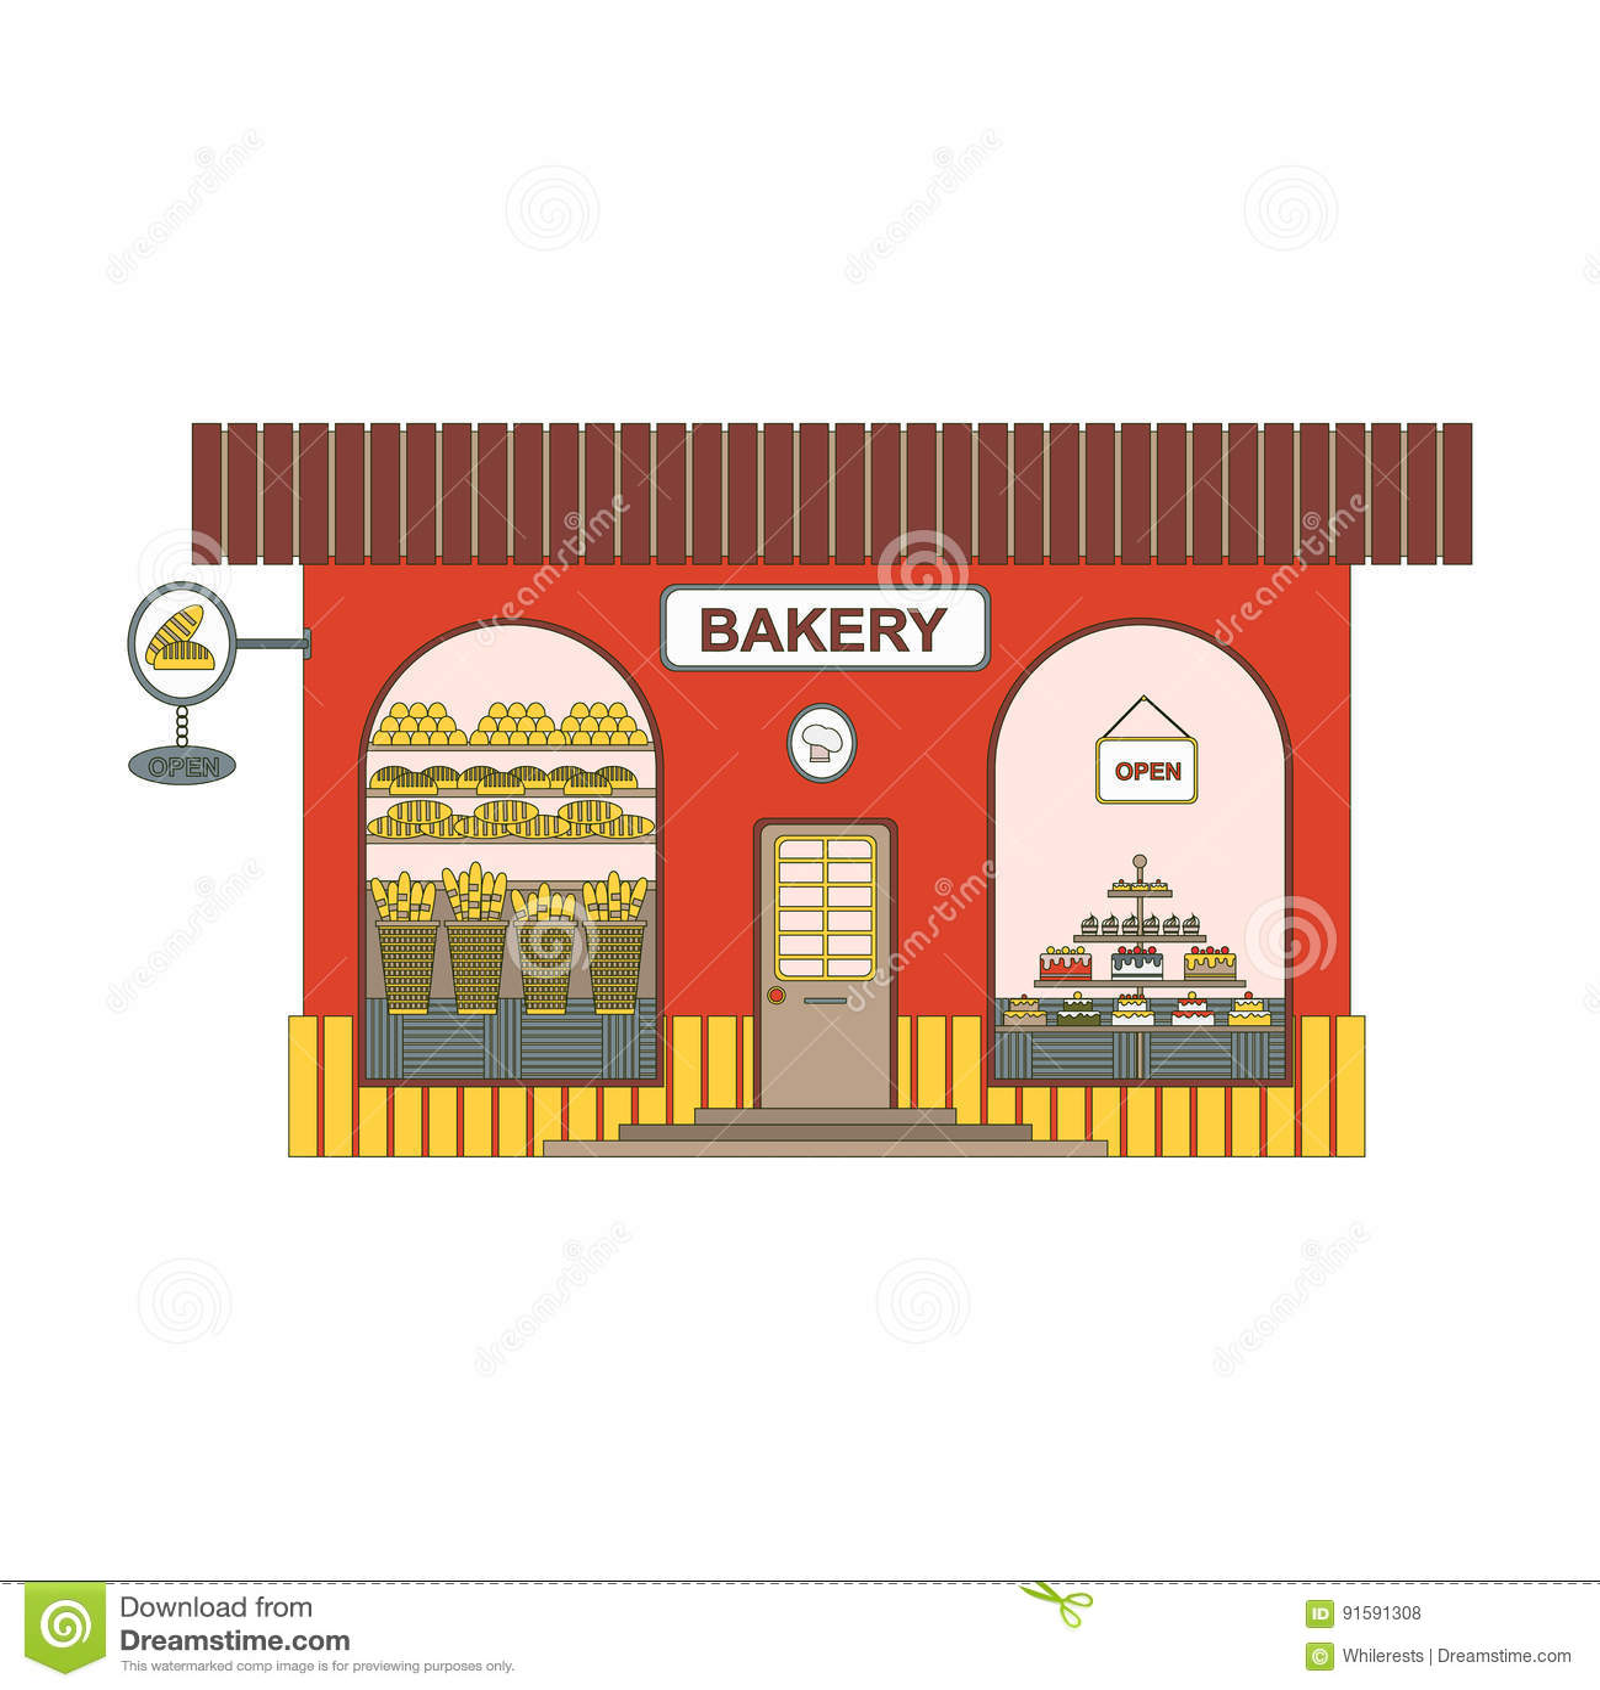 Baking Shop Cartoon Icon In Flat Style Bakery Showcase On